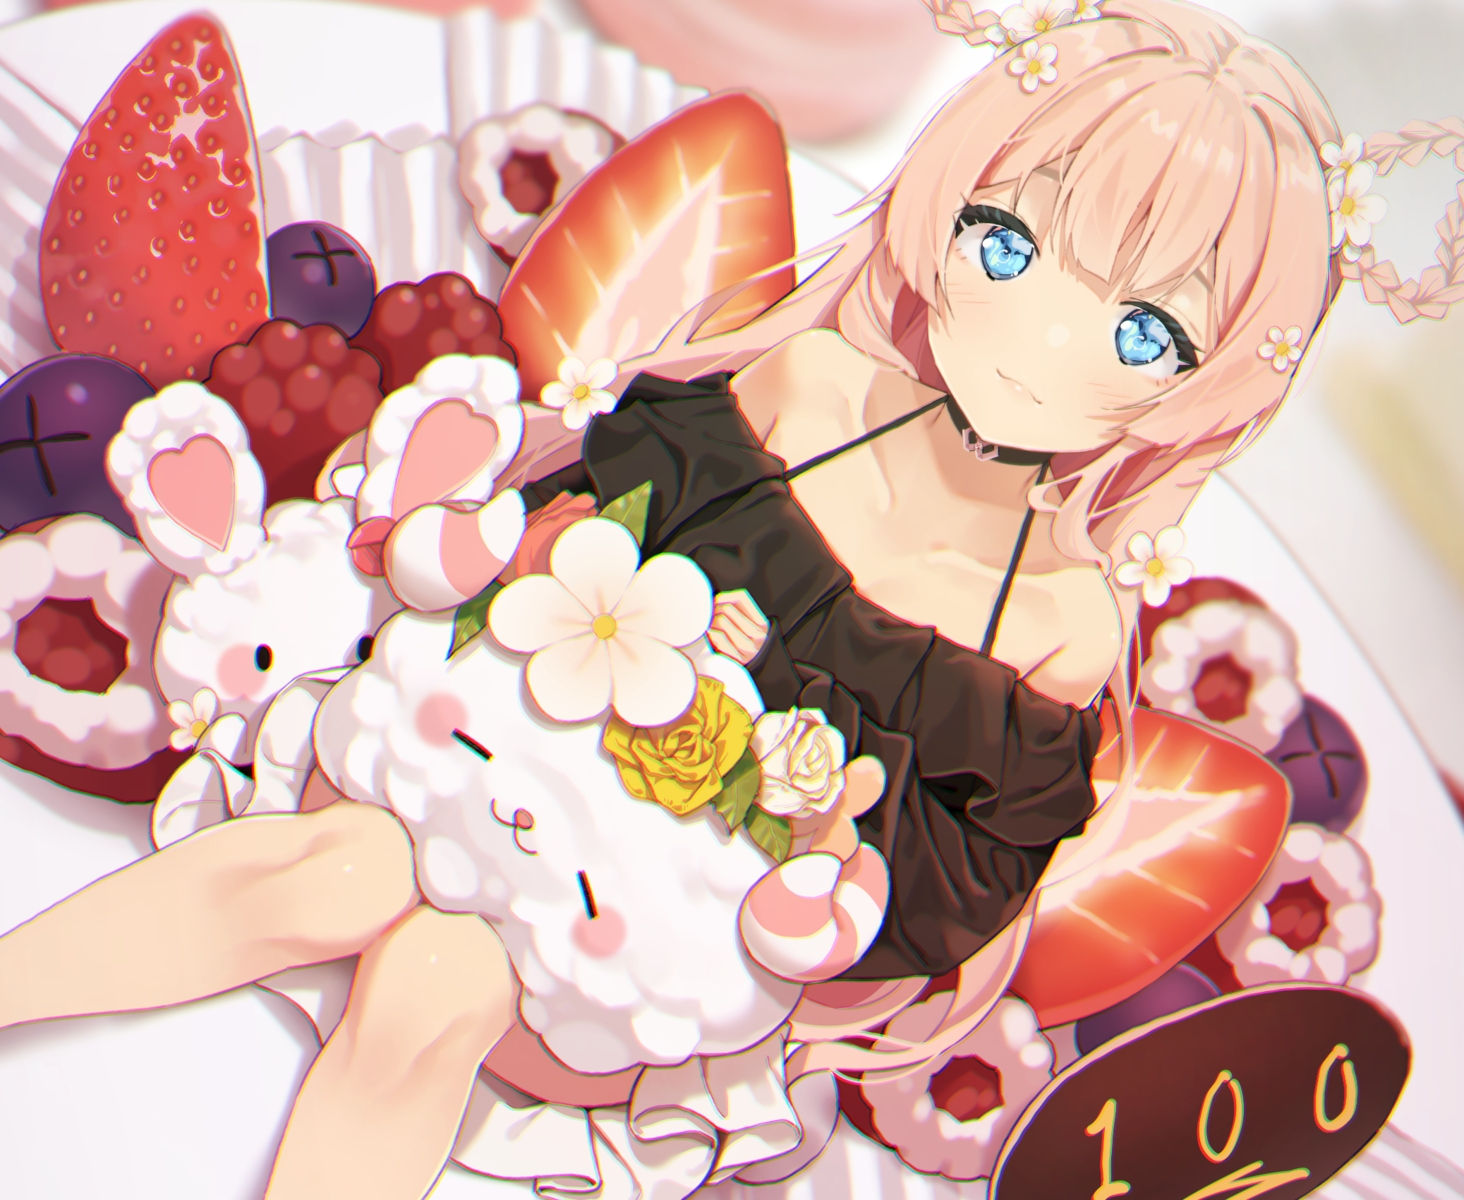 agnamore aqua_eyes blonde_hair blush braids bunny candy cat_smile chocolate choker cropped flowers food fruit long_hair original skirt strawberry